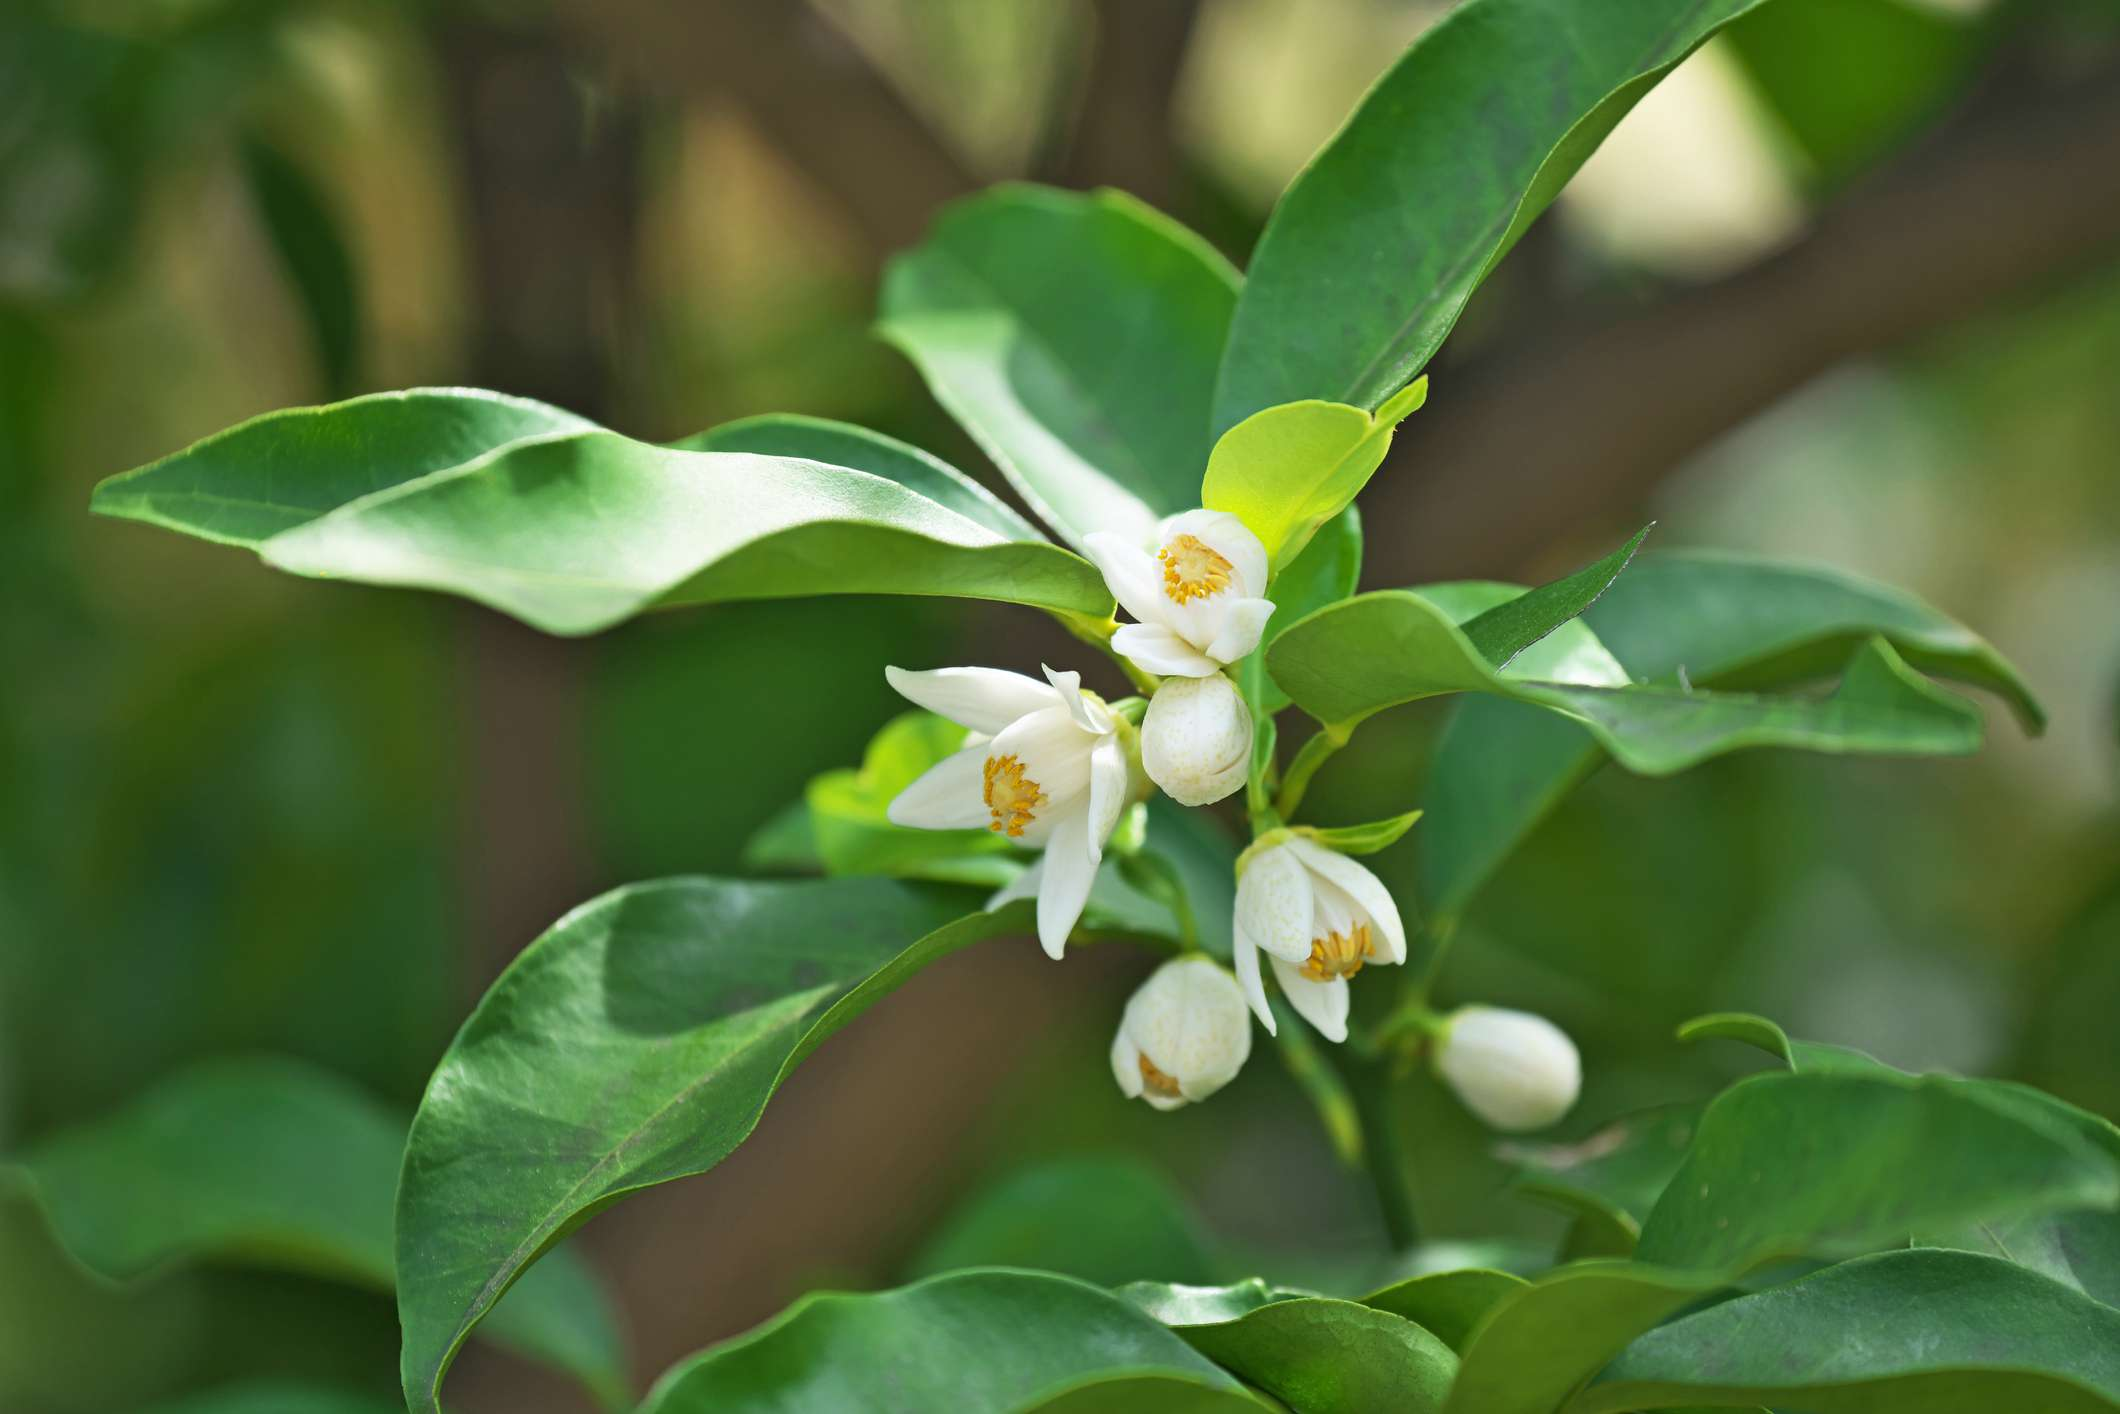 Satsuma tree blossoms